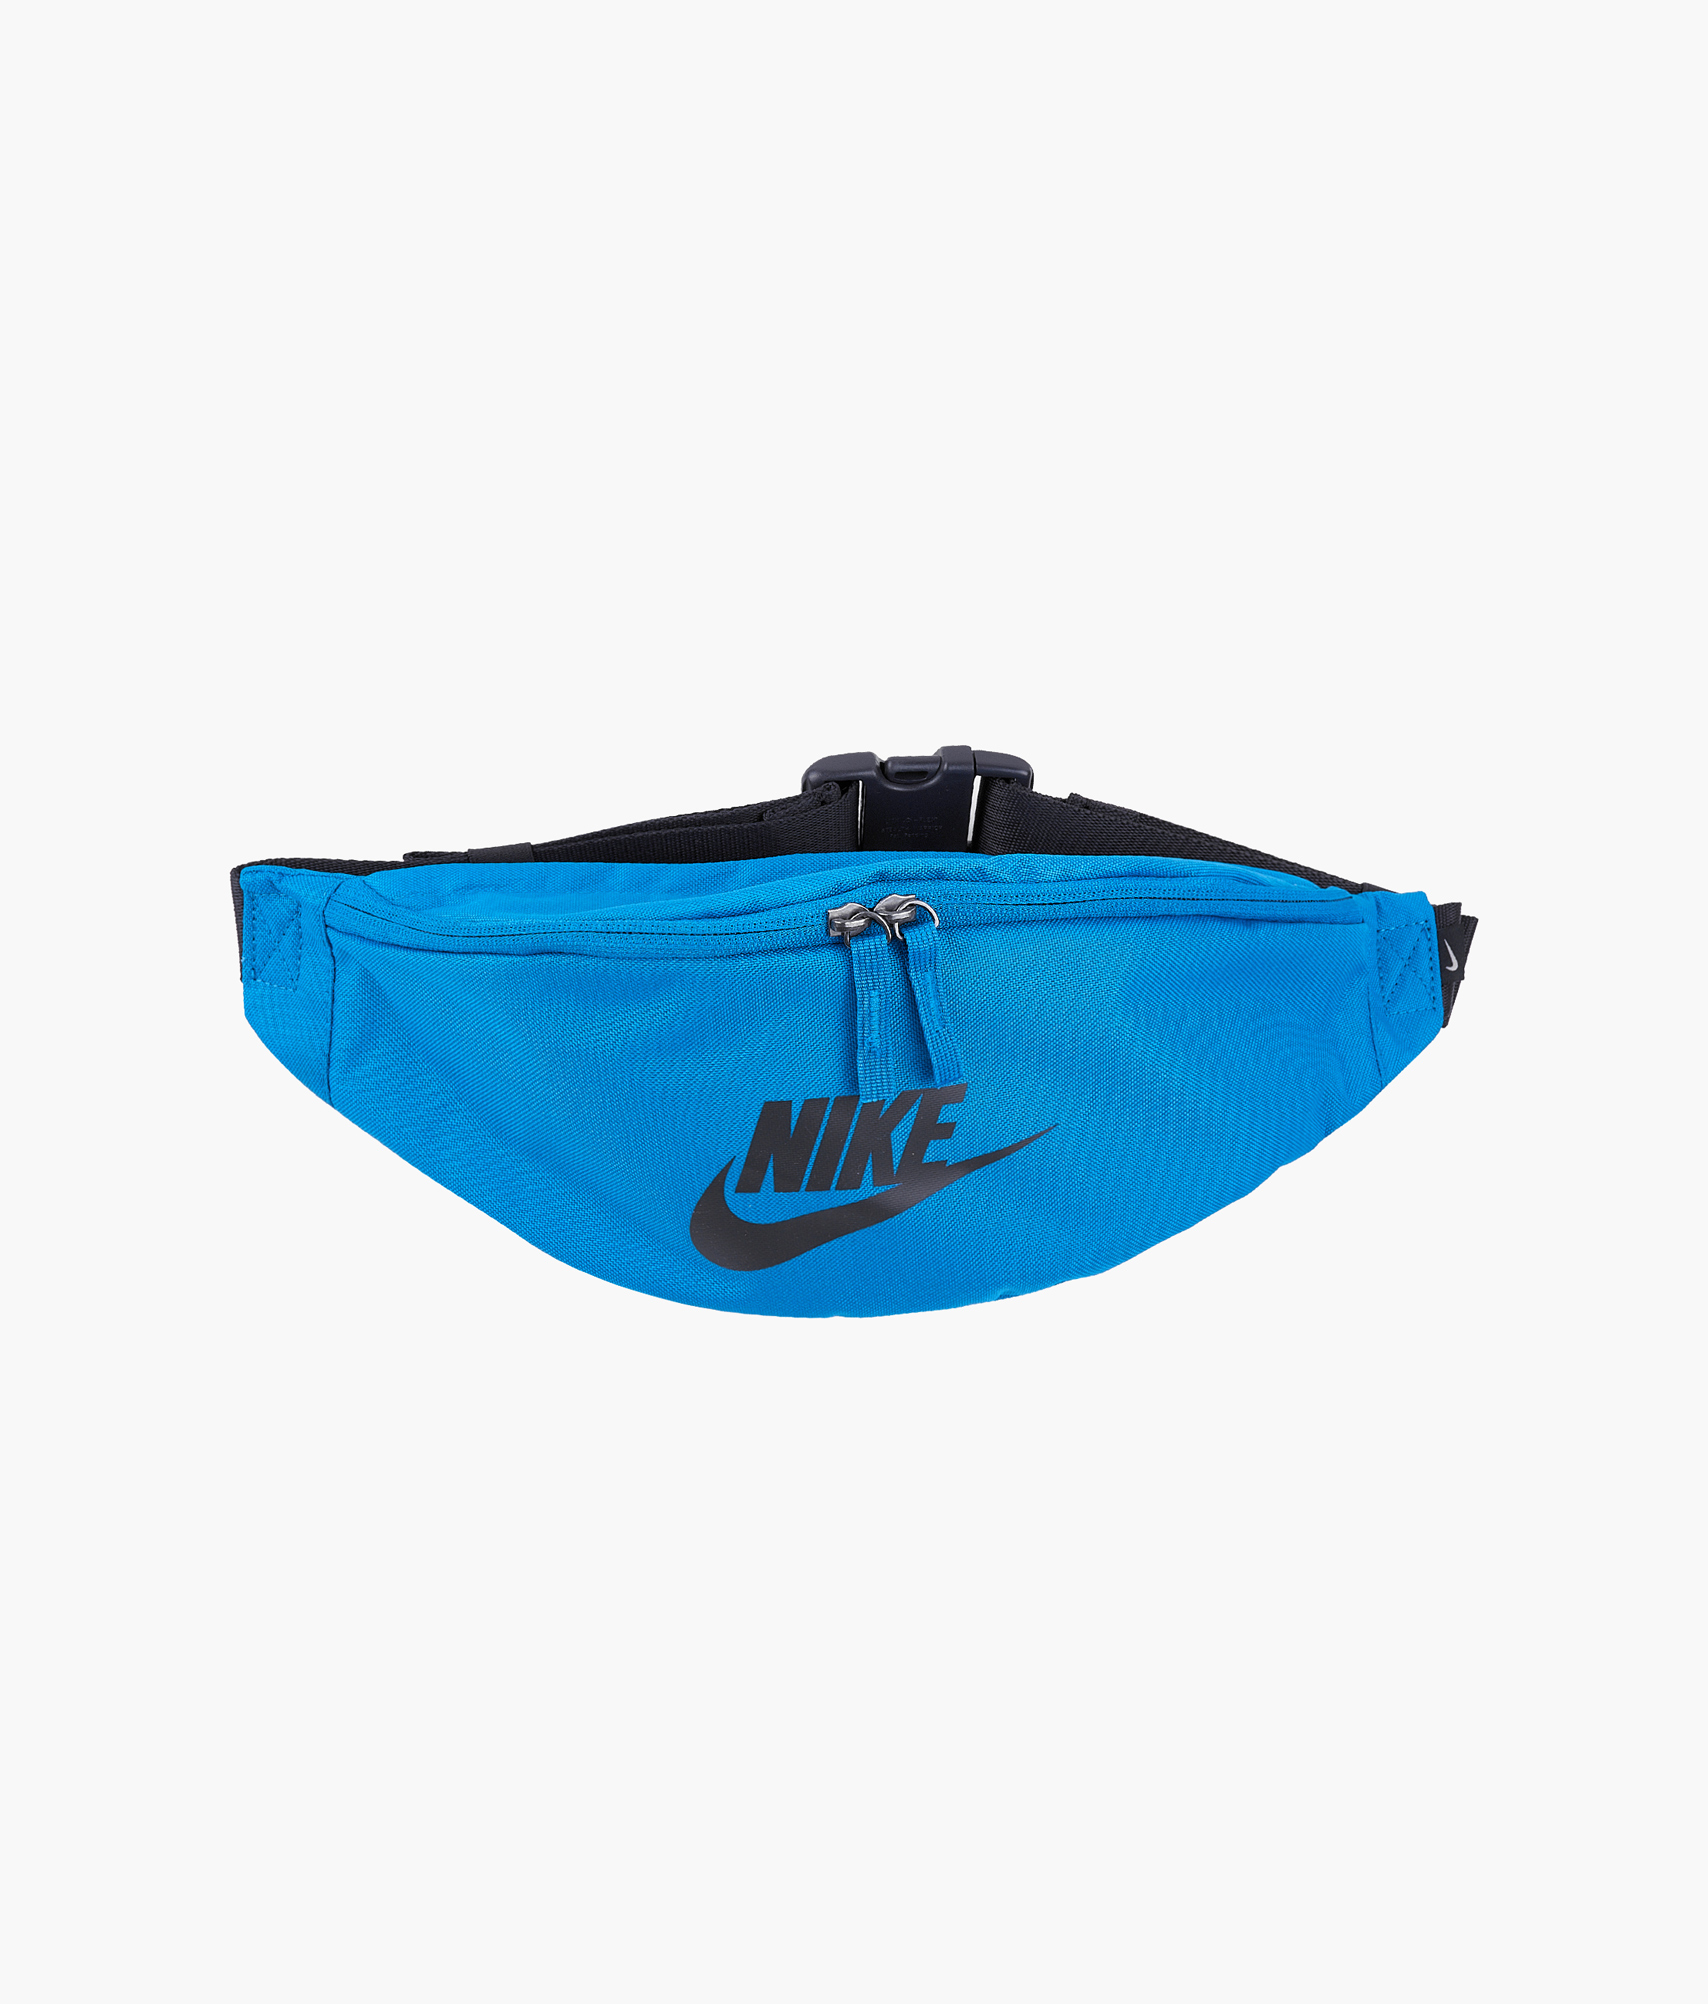 Сумка на пояс Nike Nike Цвет-Синий nike сумка на пояс nike